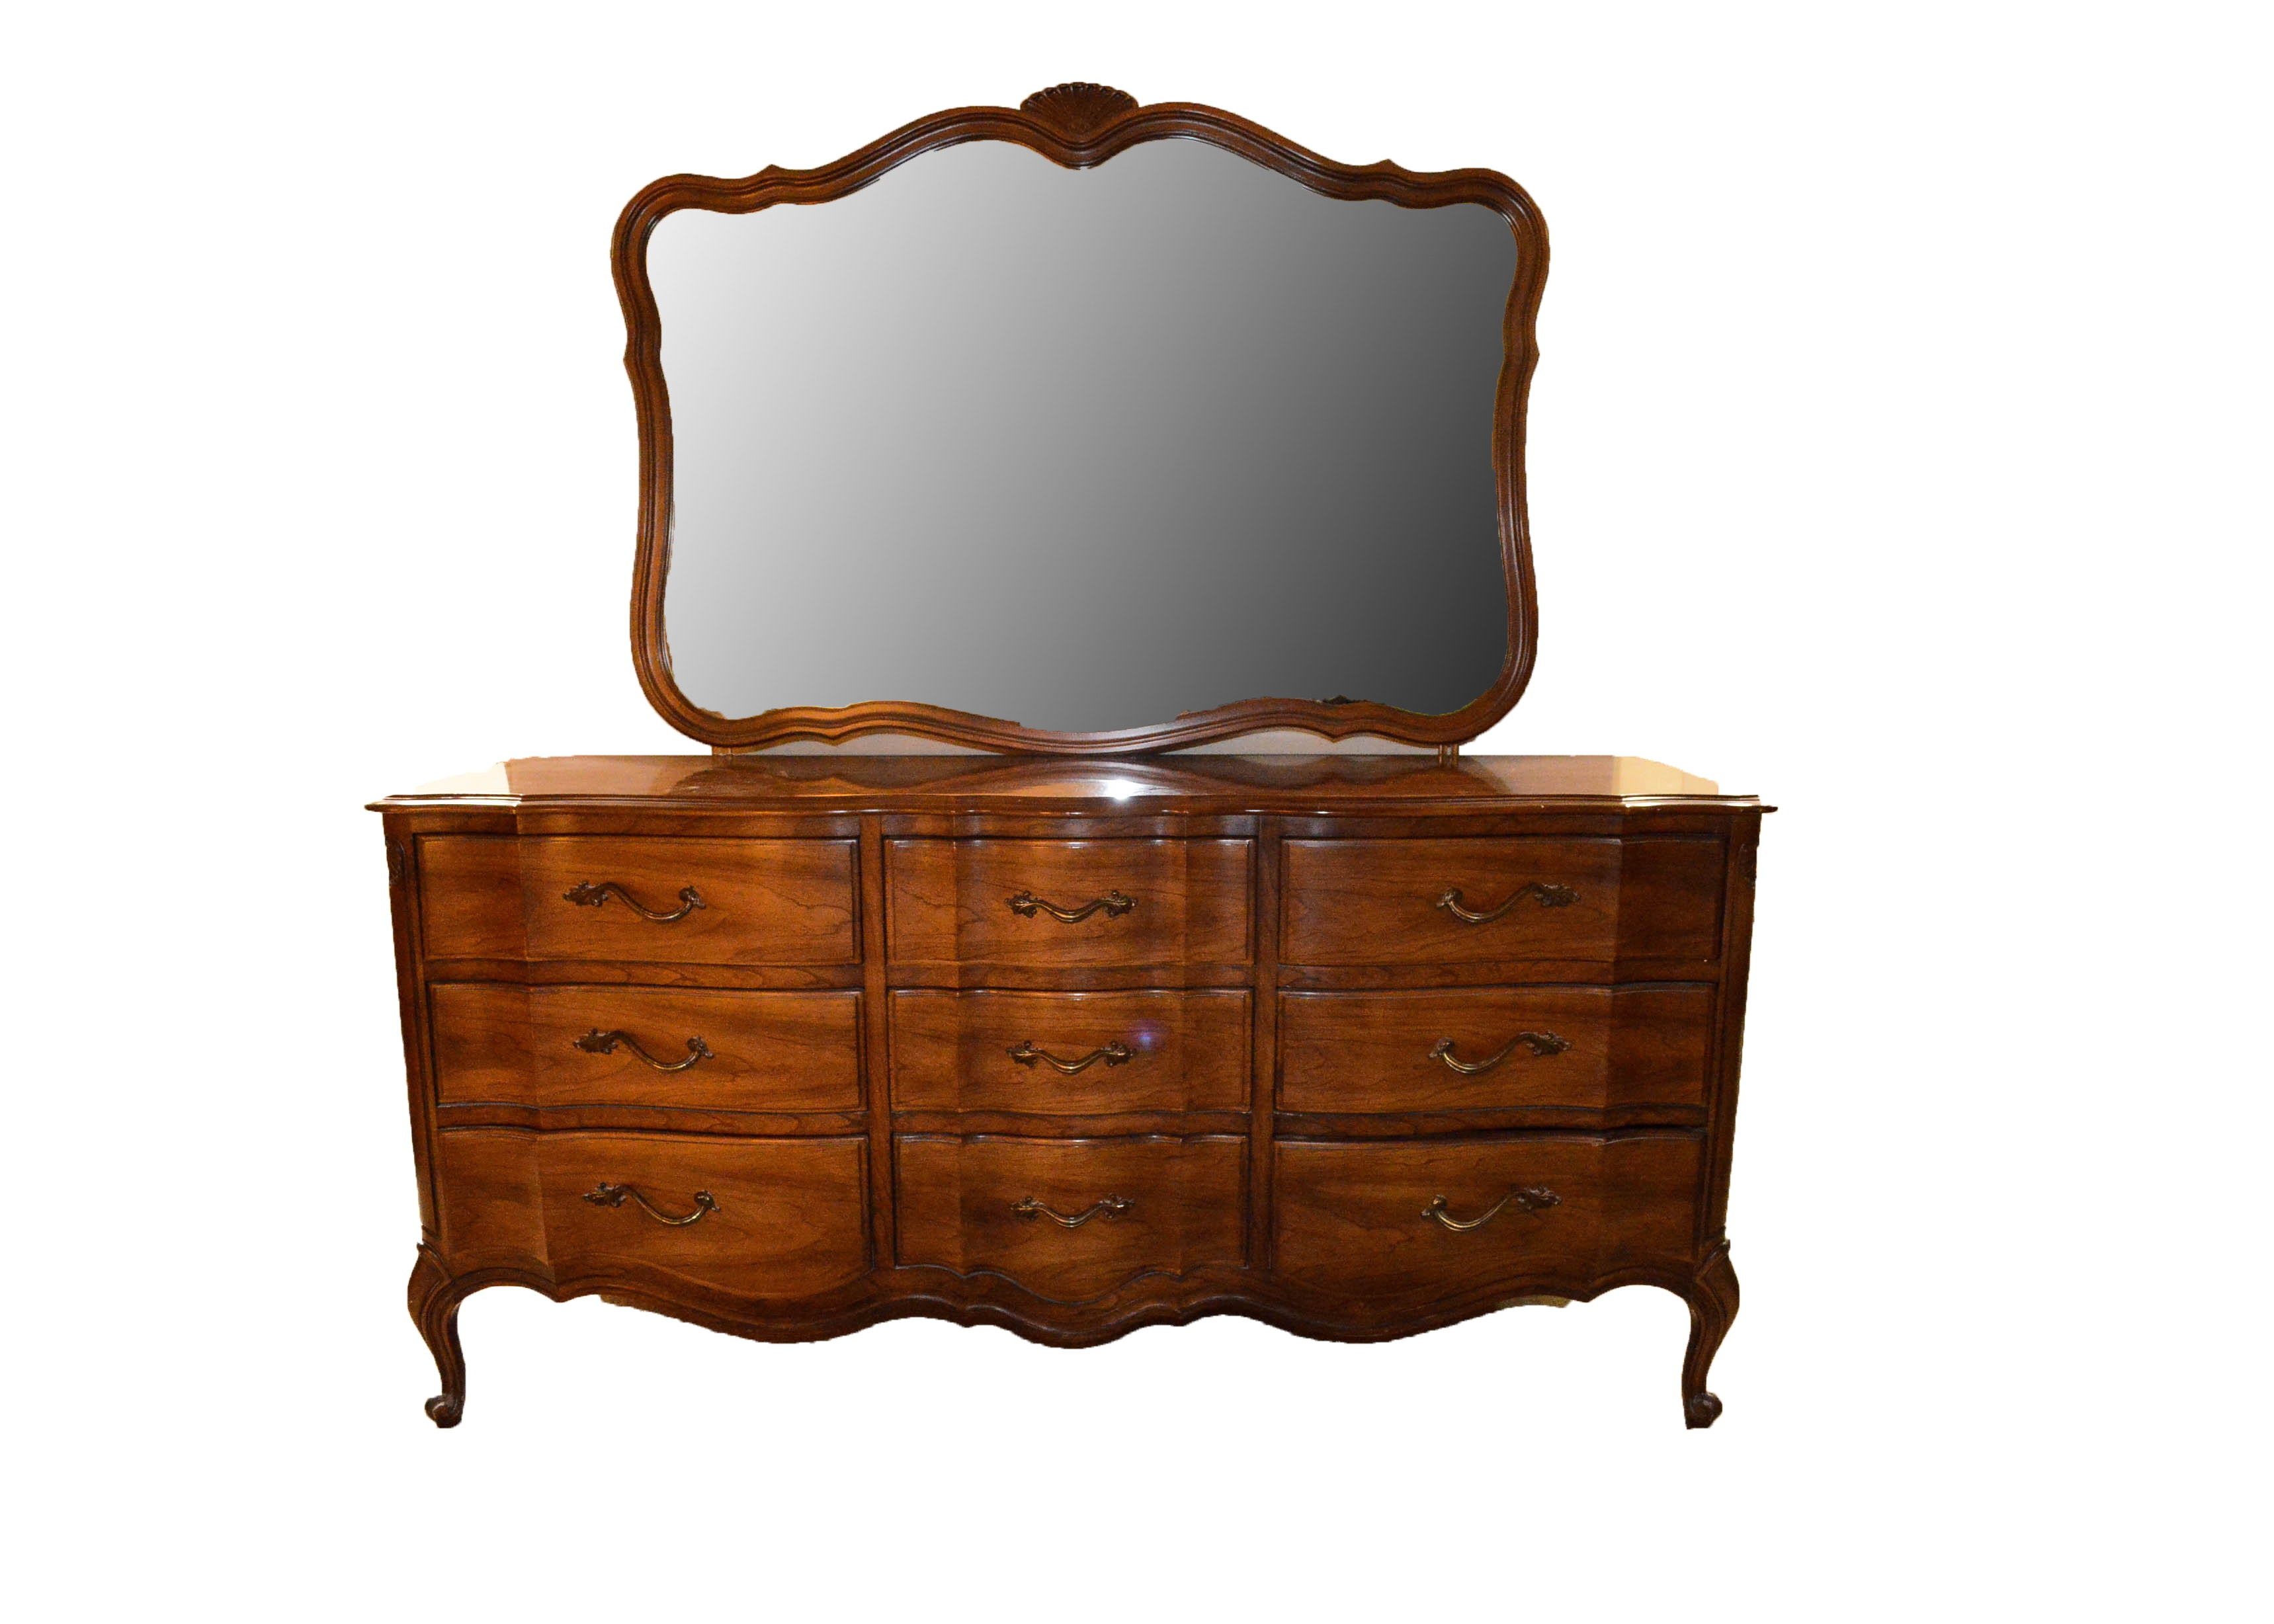 Captivating Vintage Broyhill Premier Dresser With Mirror ...